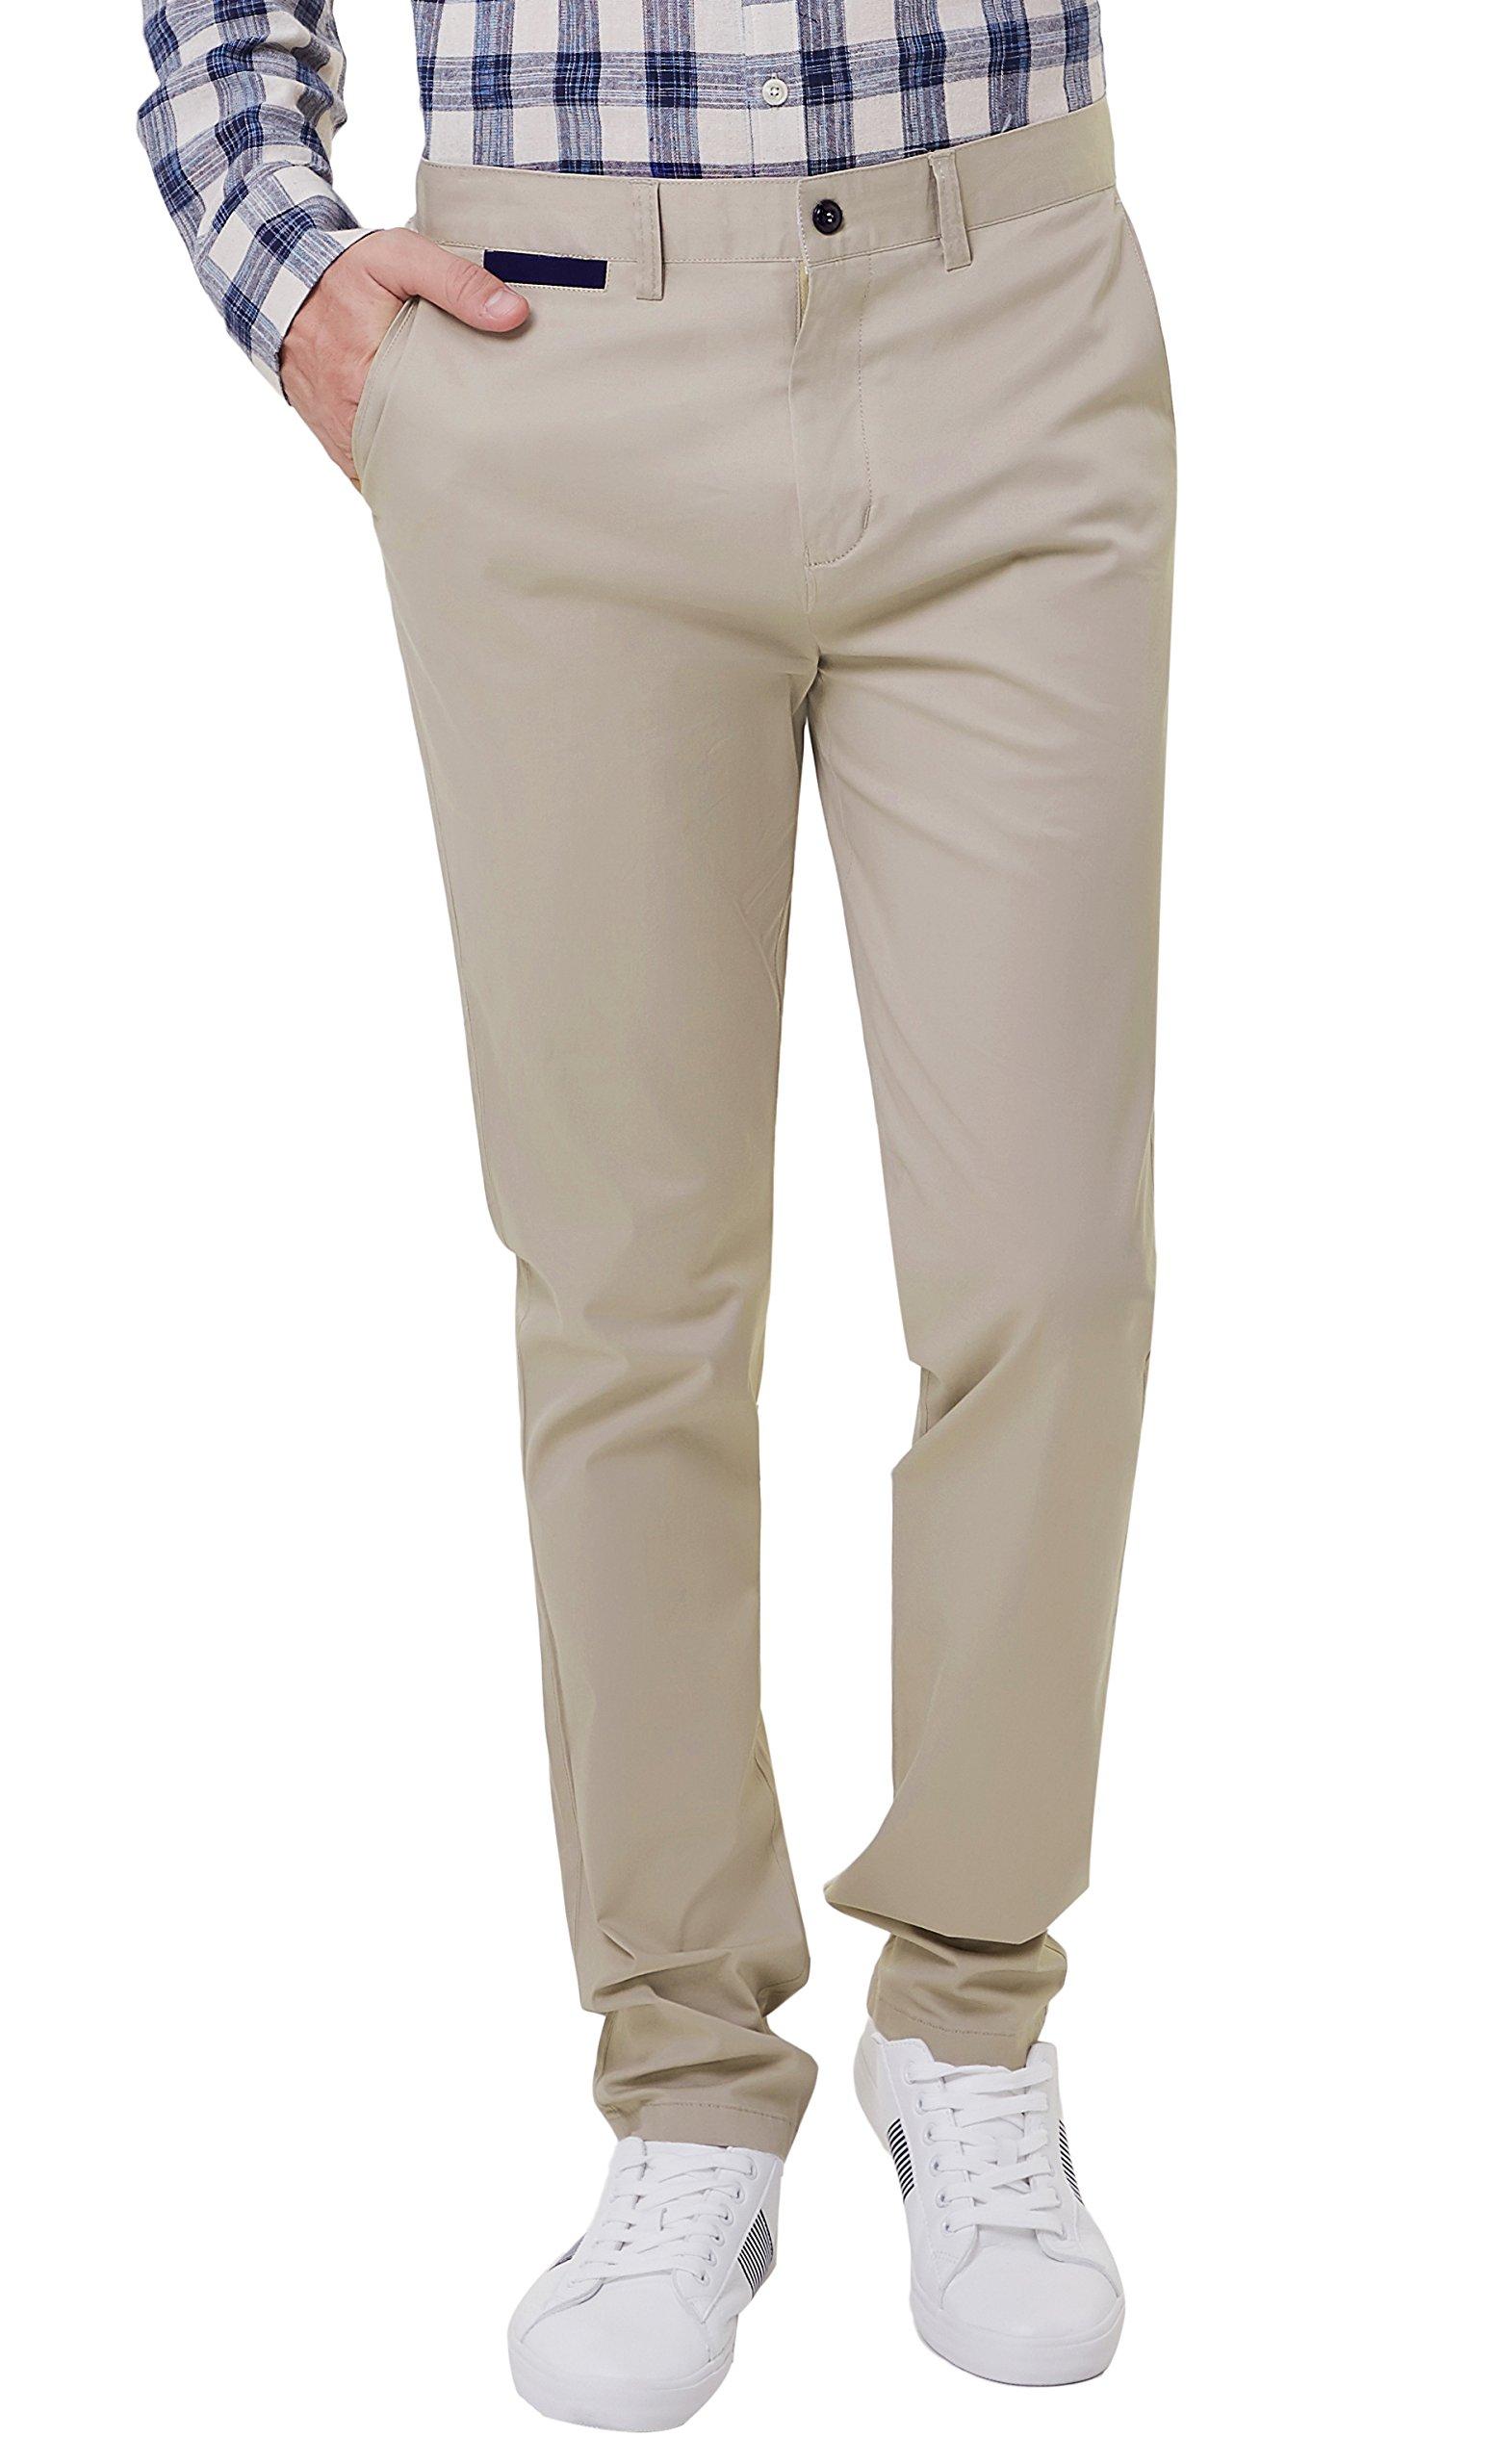 PAUL JONES Men's Stretchy Slimming Tapered Business Casual Work Pant Size XXL Light Khaki